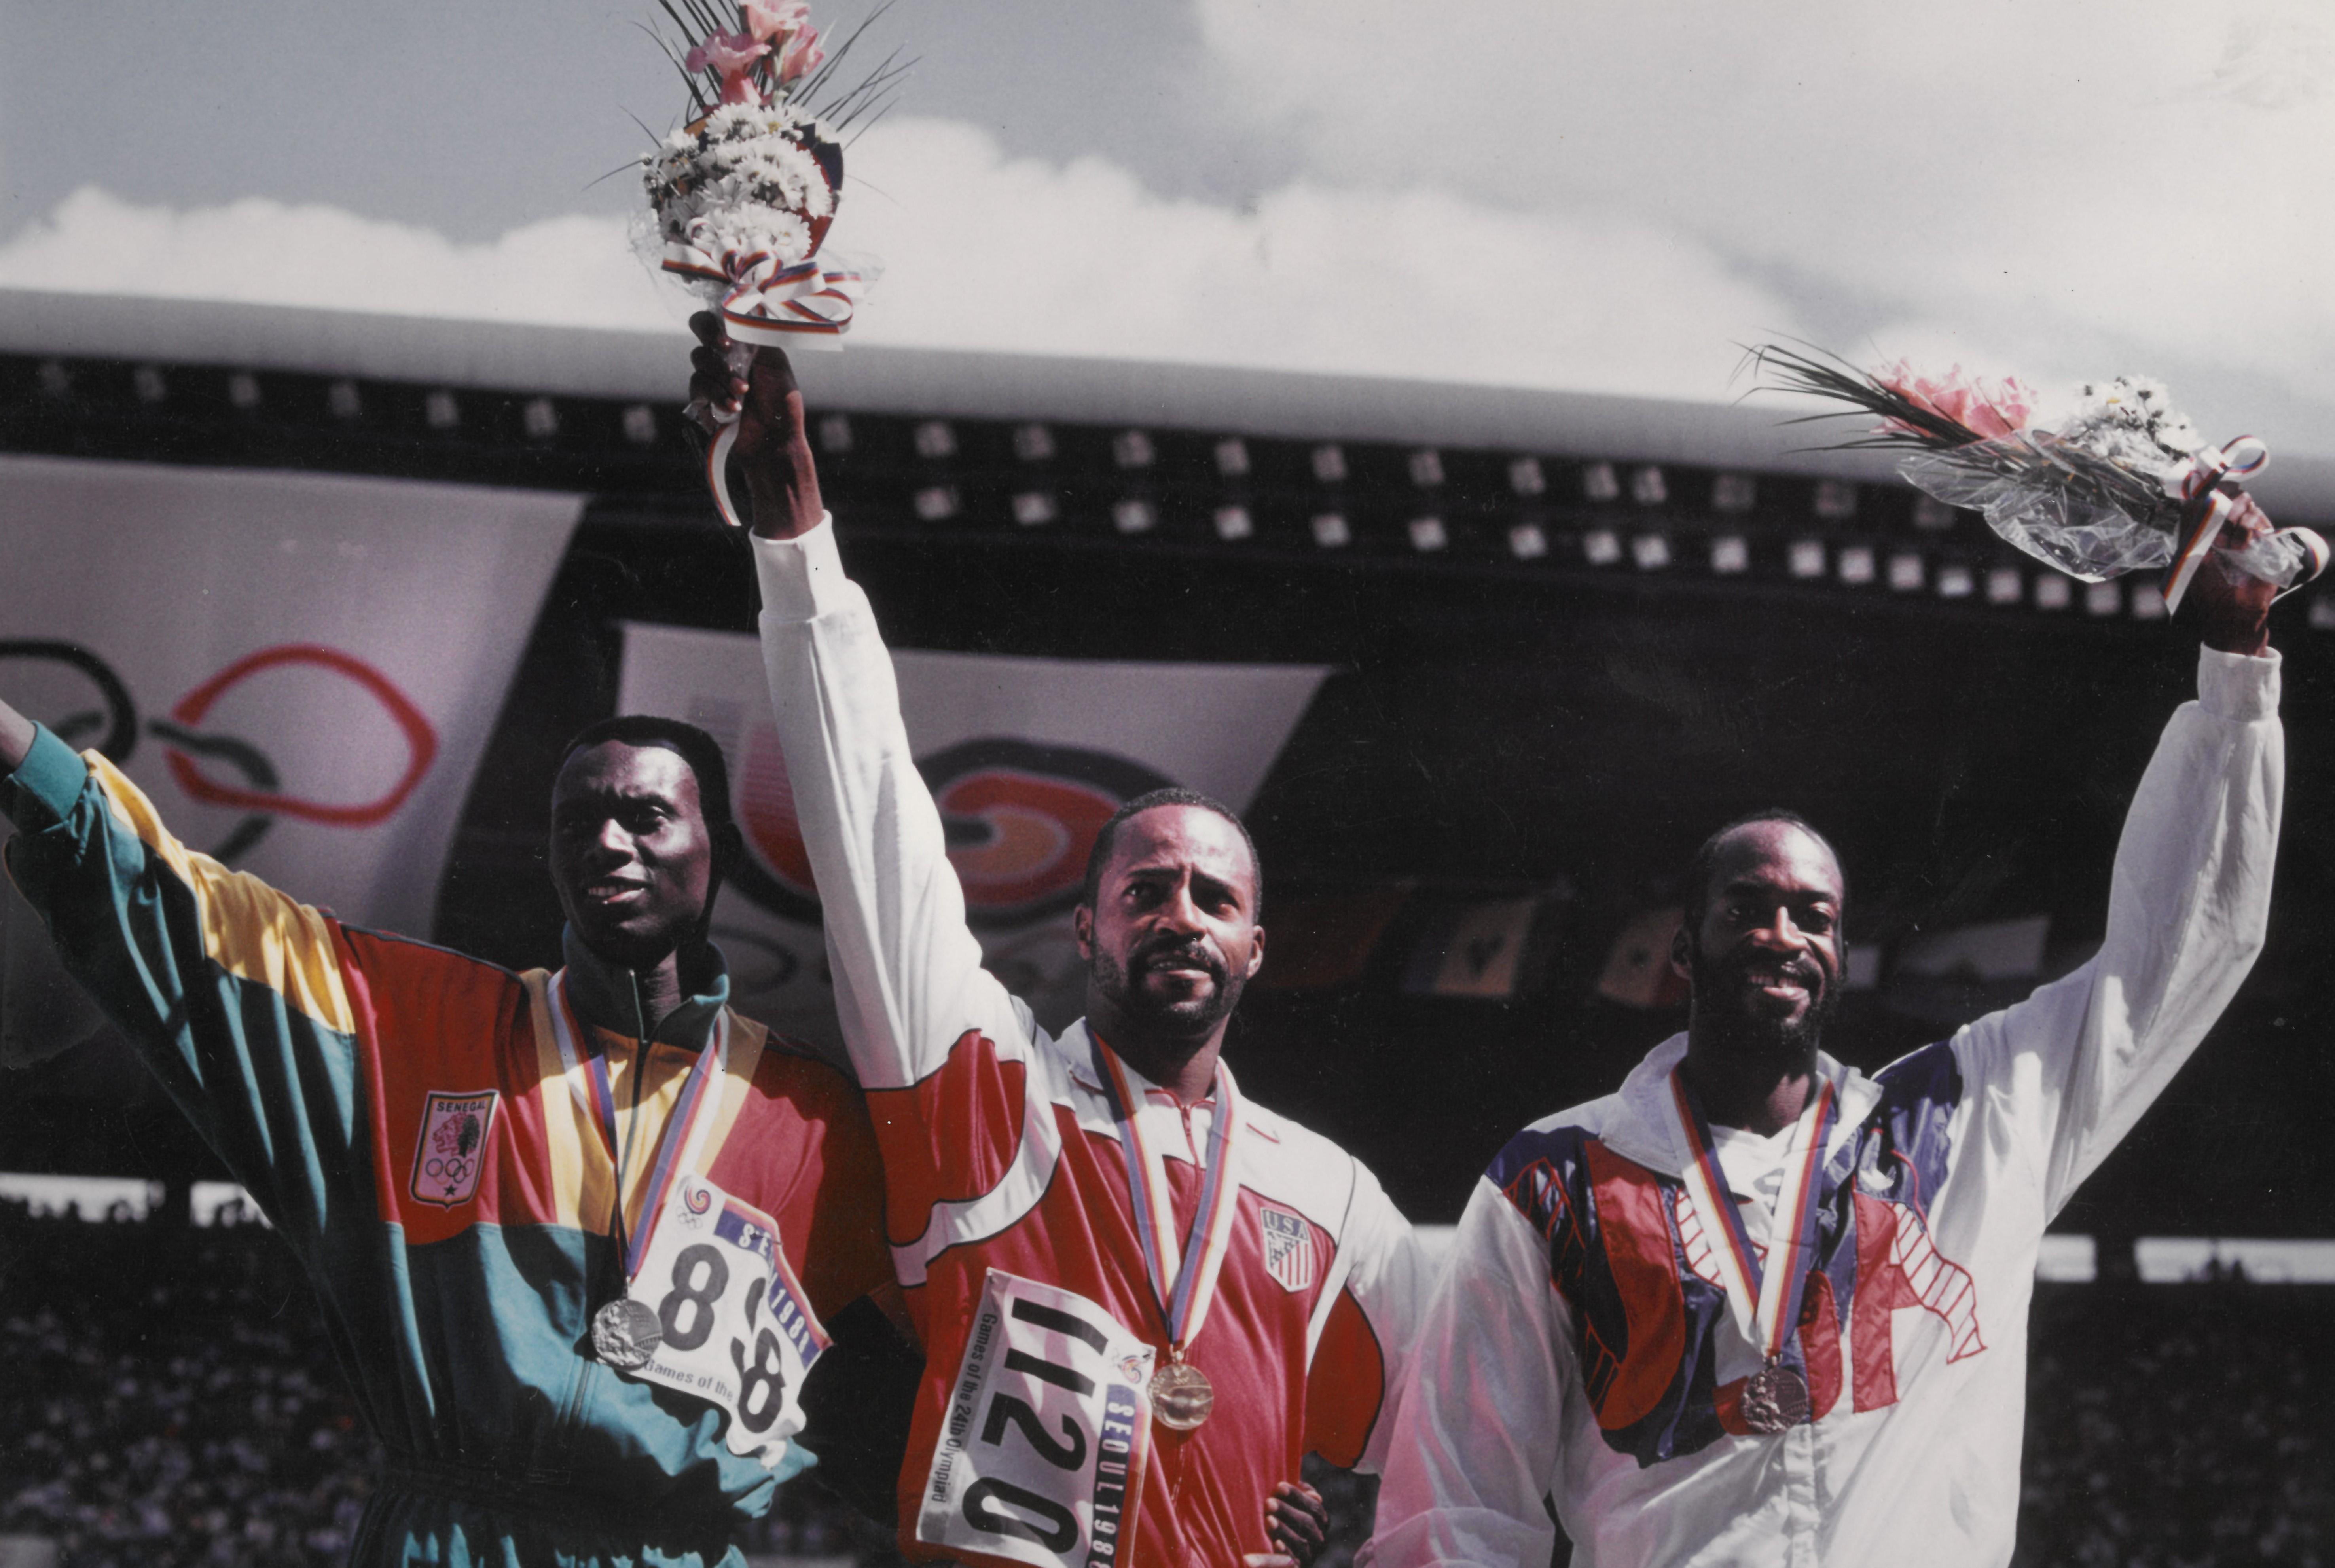 1988 Olympics Men's Finals 400m Hurdles - Medal Ceremony with Dia Ba, Phillips, Moses